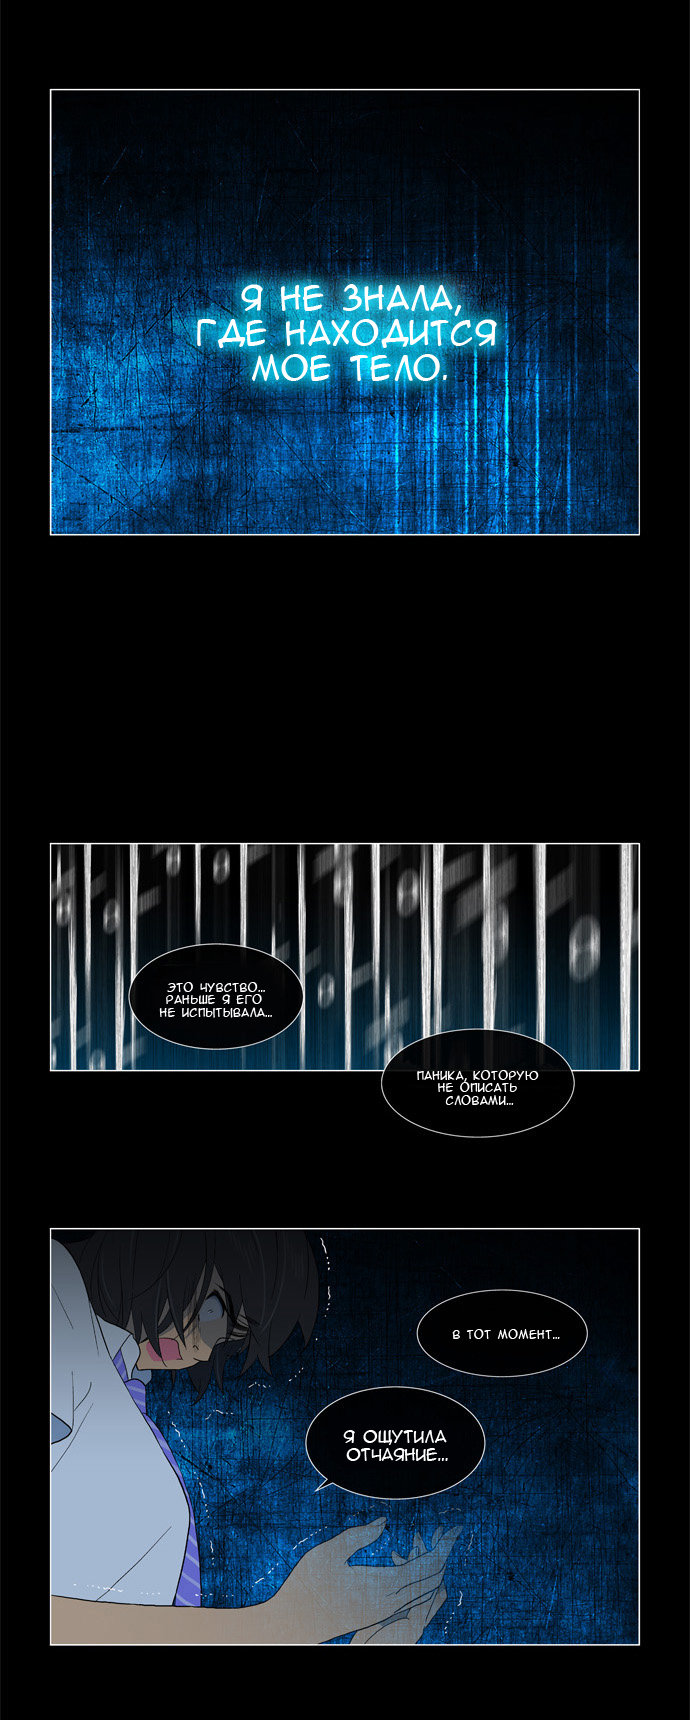 https://r1.ninemanga.com/comics/pic2/32/21344/207411/1427848148901.jpg Page 5